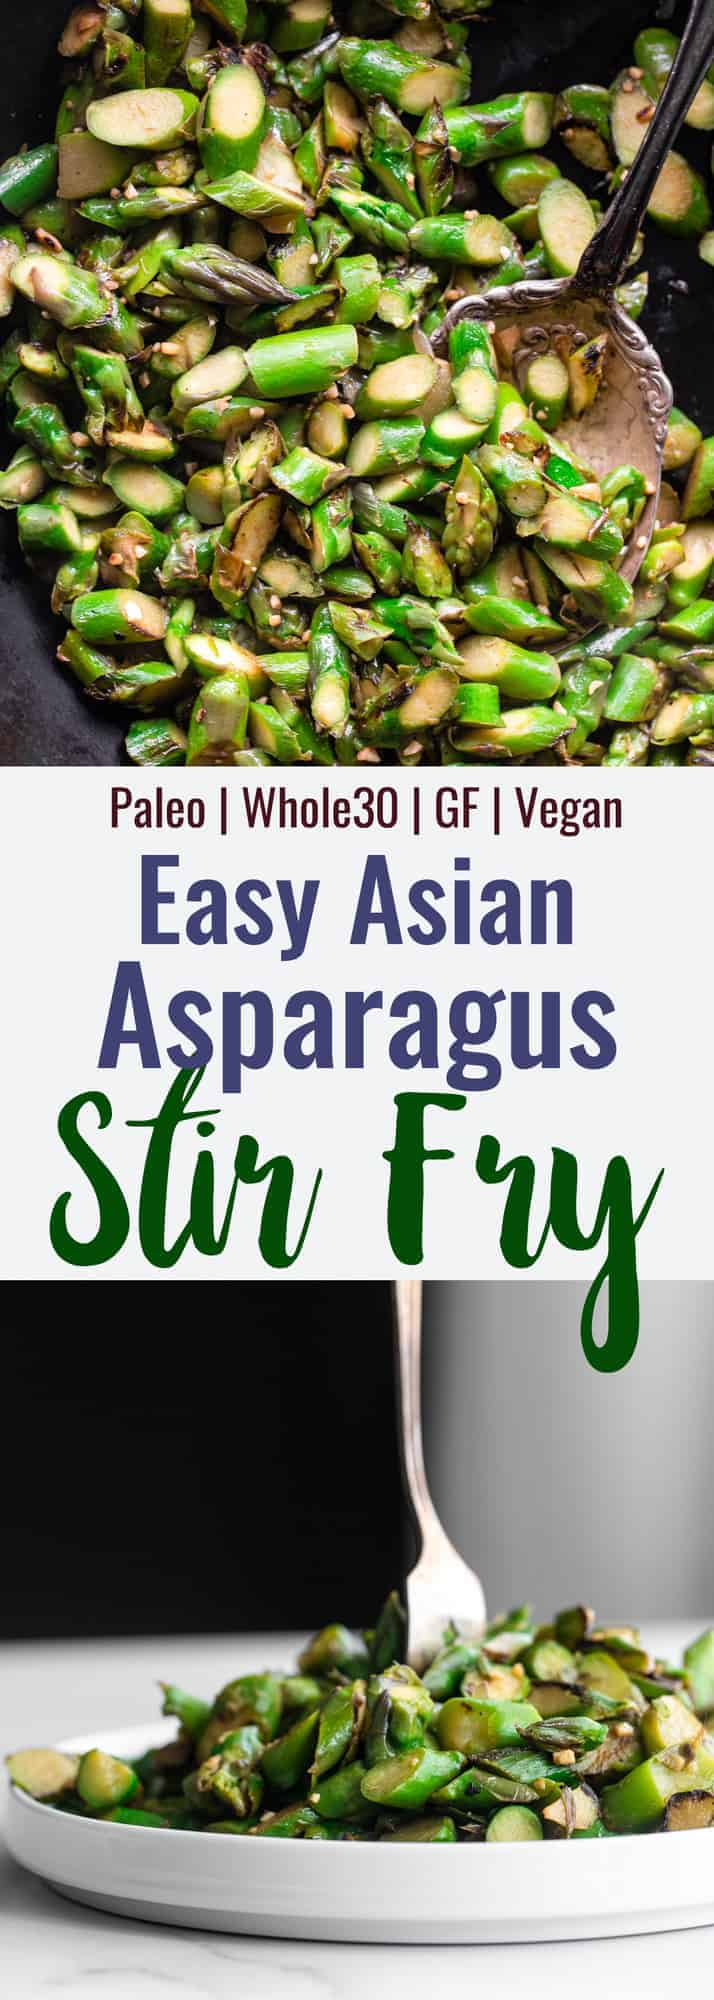 Asparagus Stir Fry collage photo